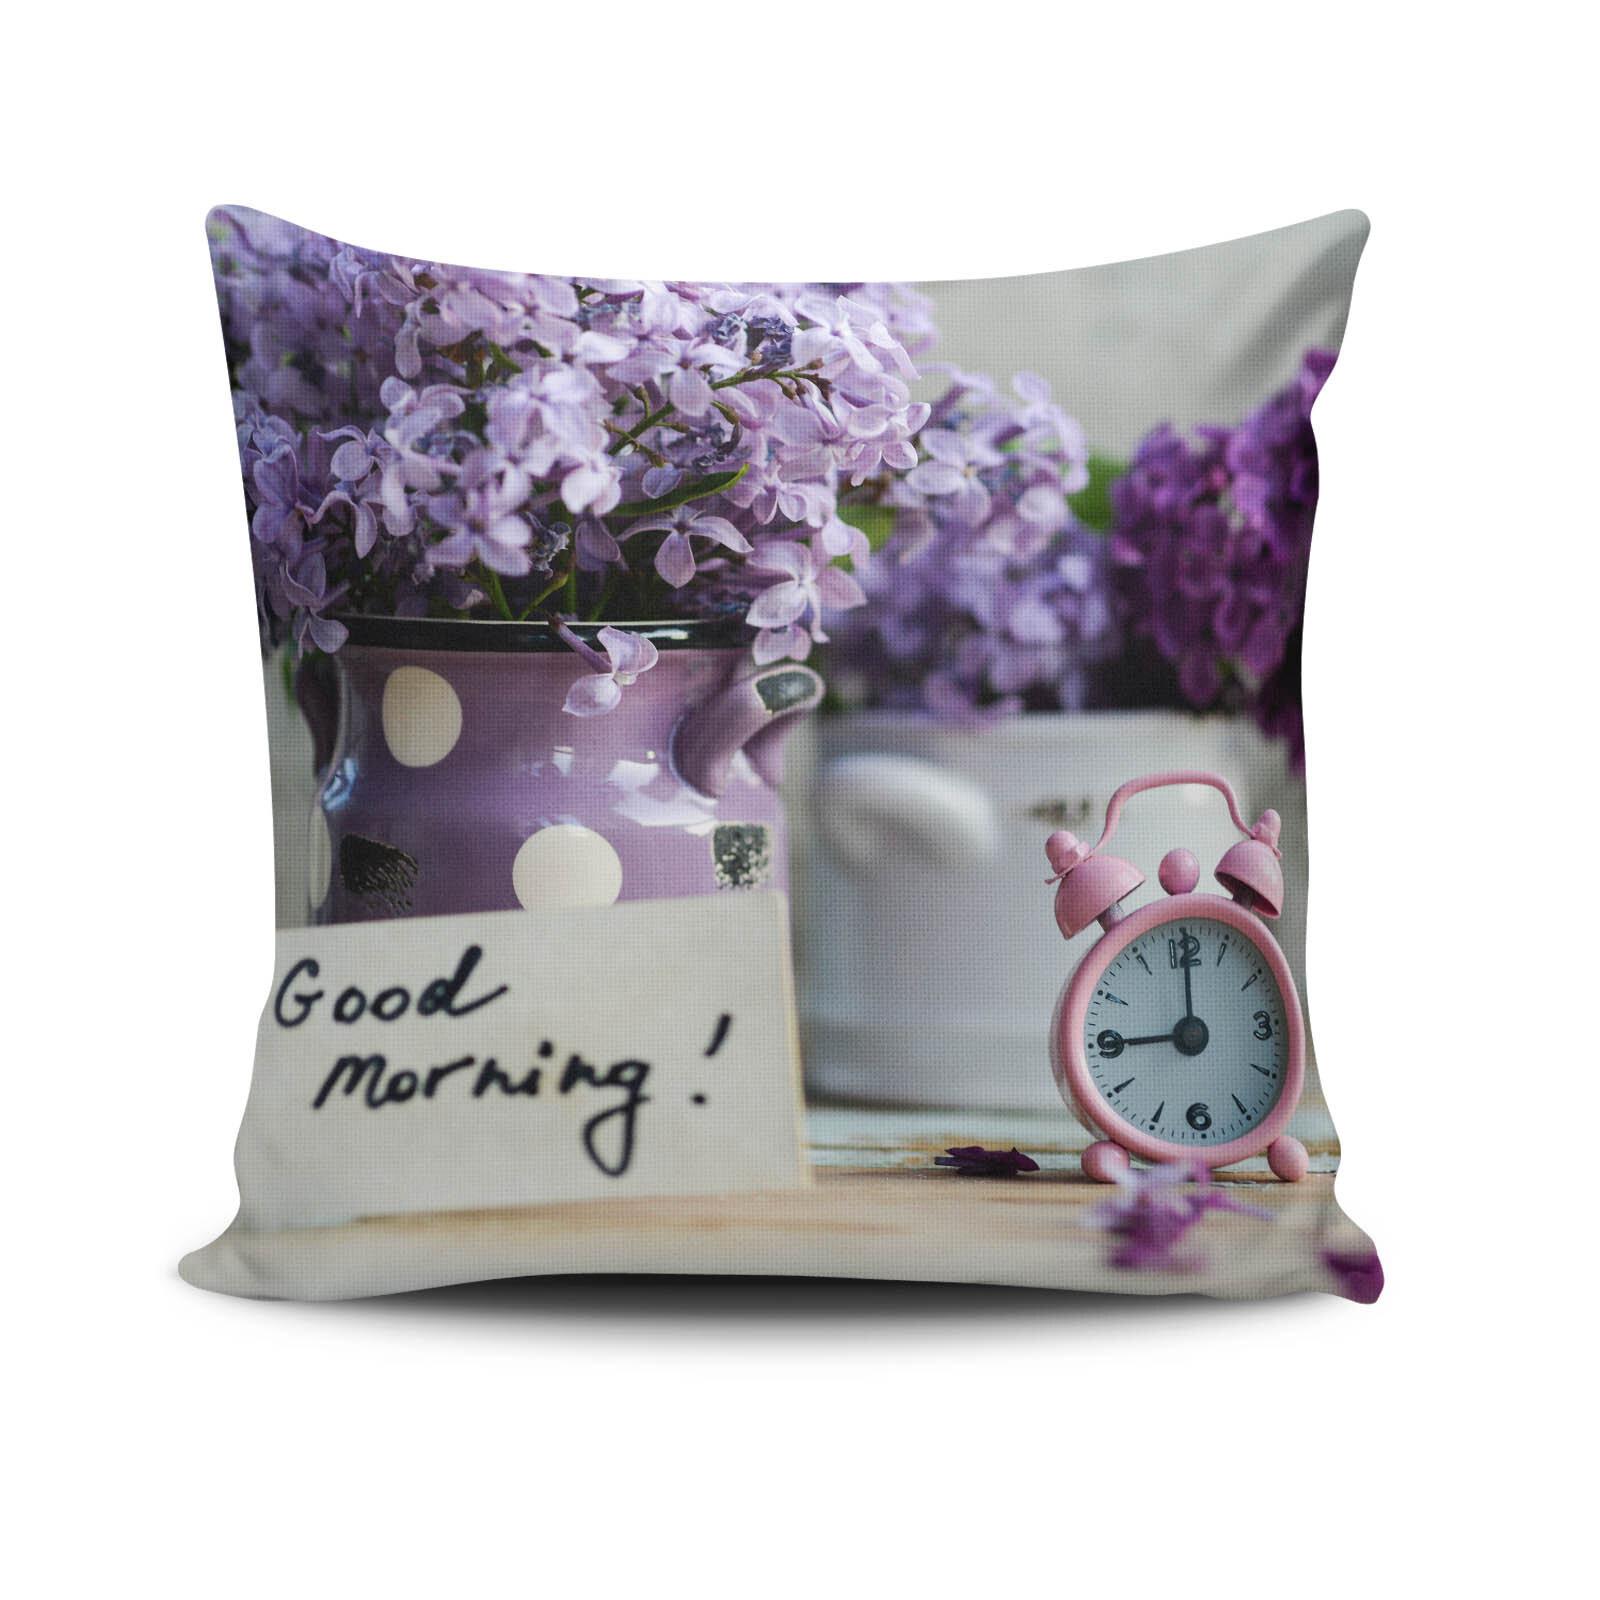 Perna decorativa Cushion Love, Dimensiune: 45 x 45 cm, Material exterior: 50% bumbac / 50% poliester 768CLV0122